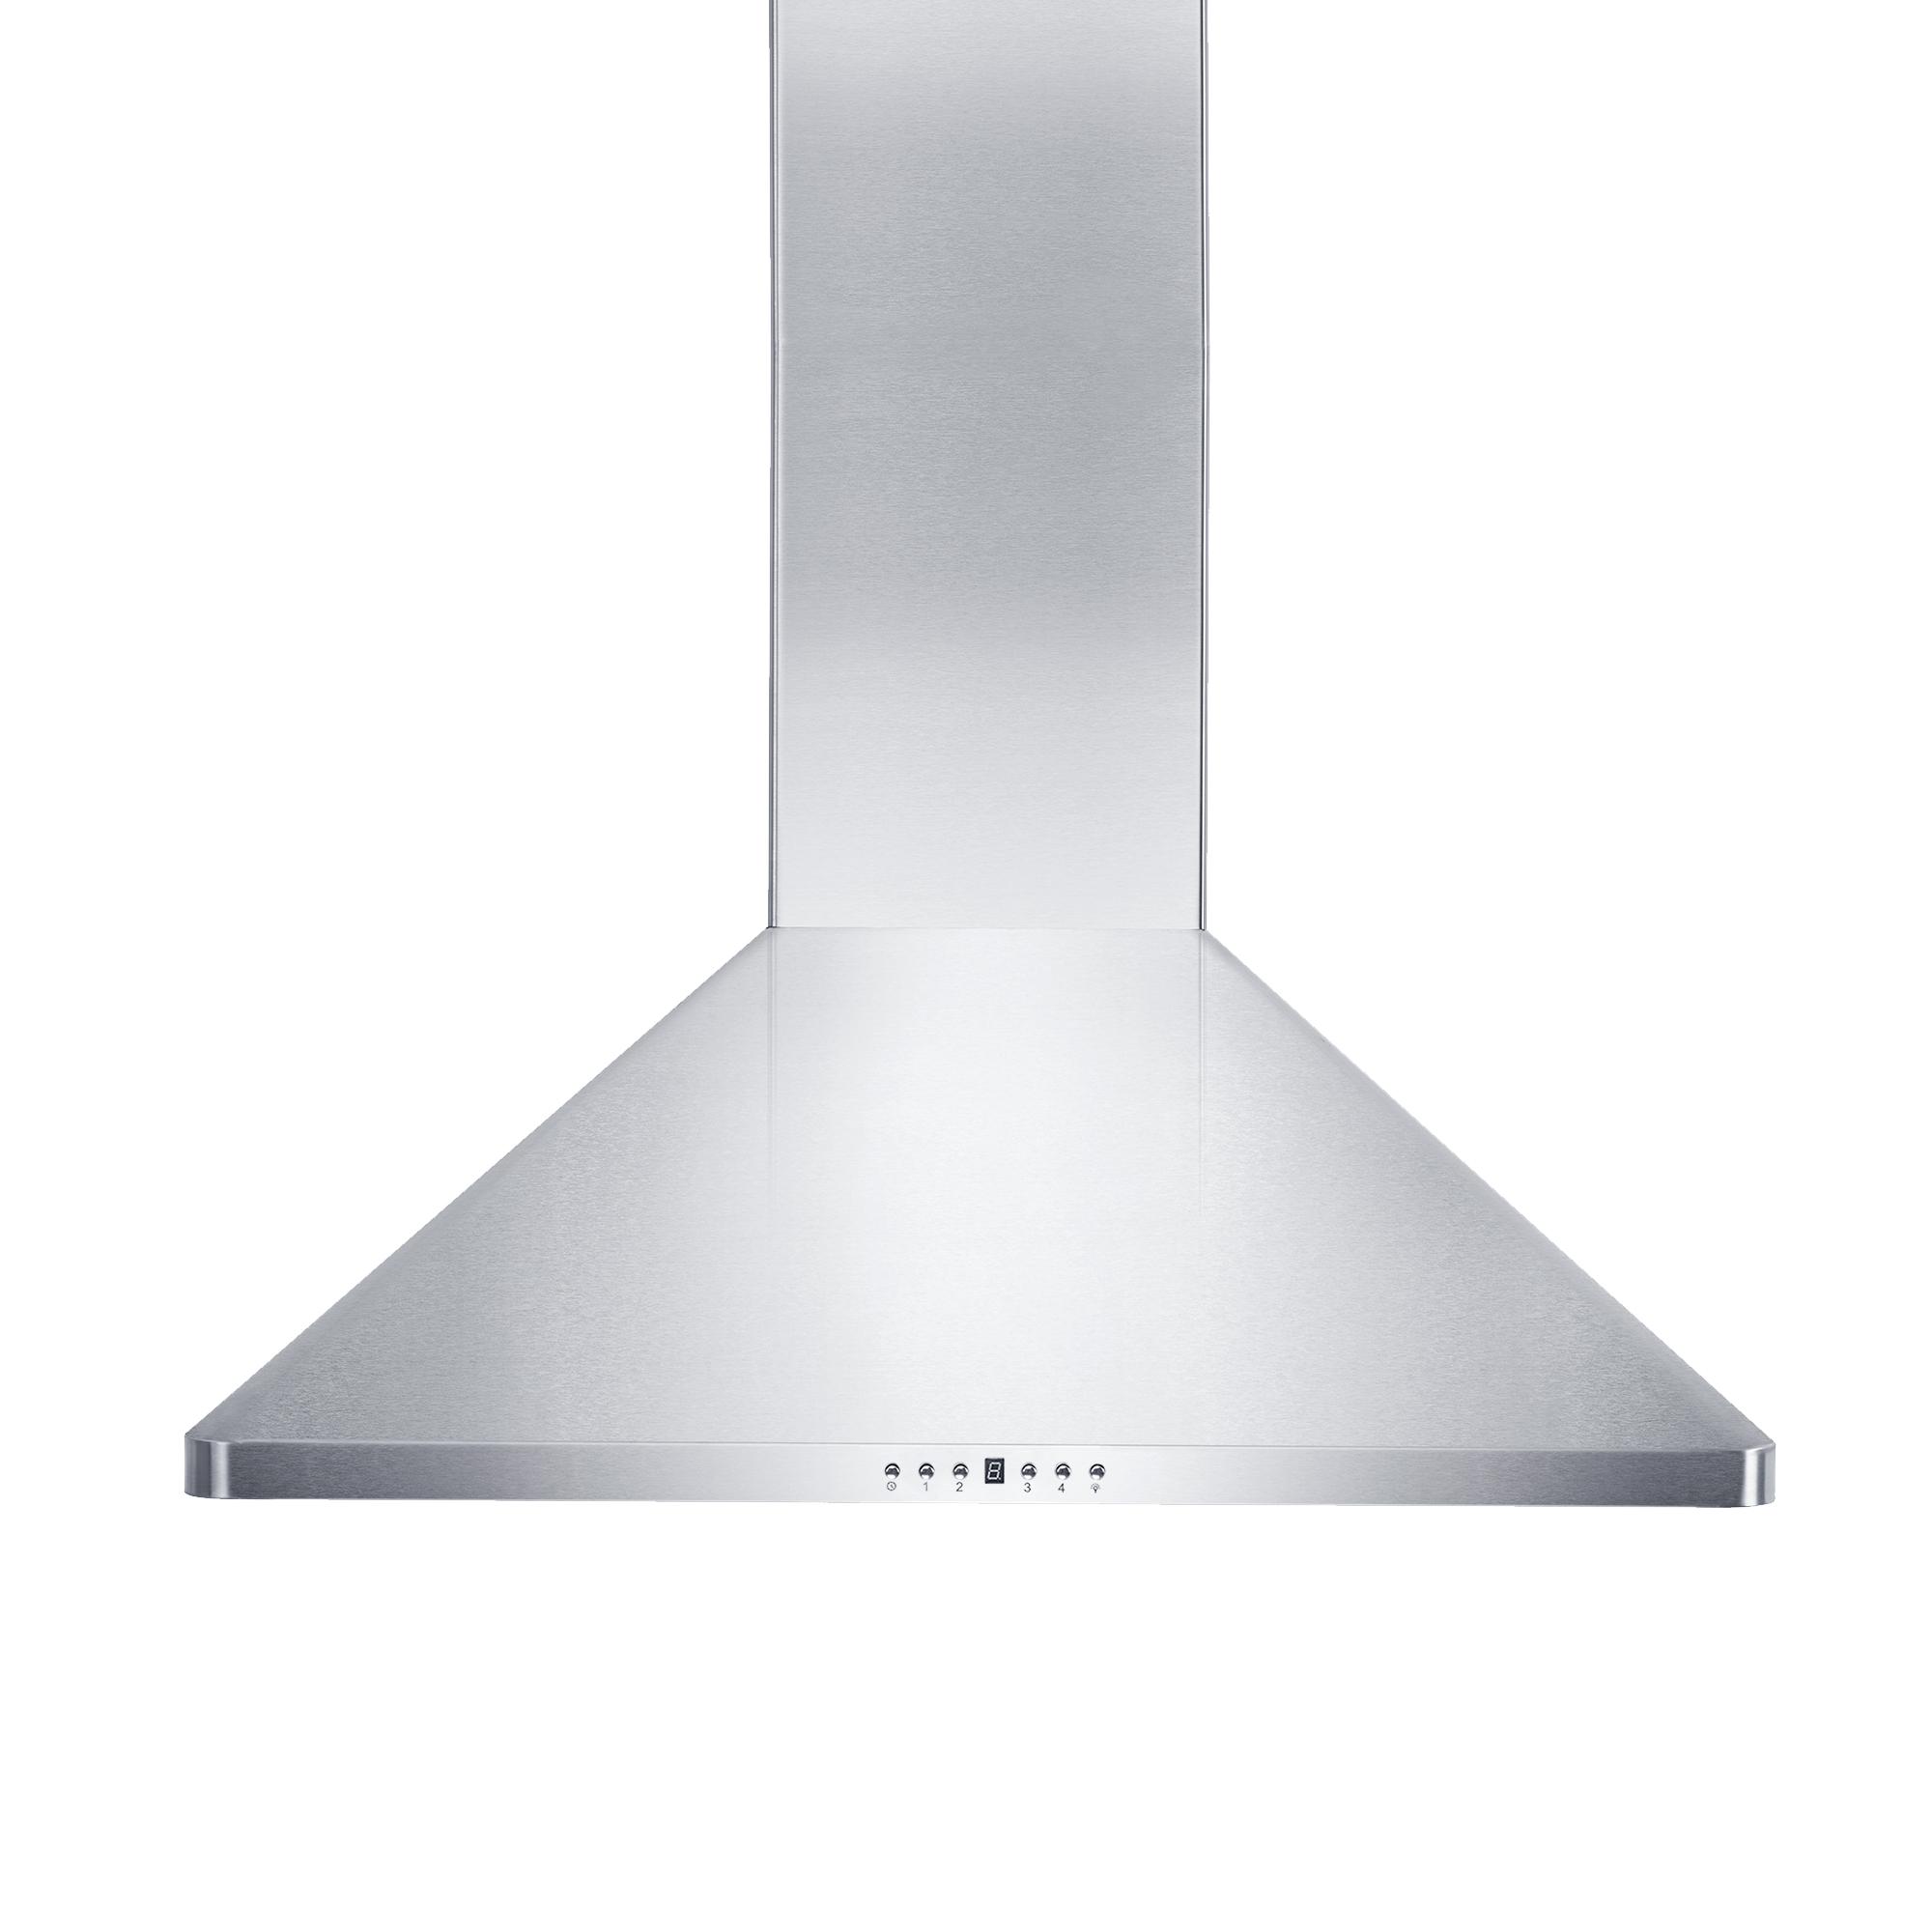 zline-stainless-steel-wall-mounted-range-hood-KF1-front.jpg